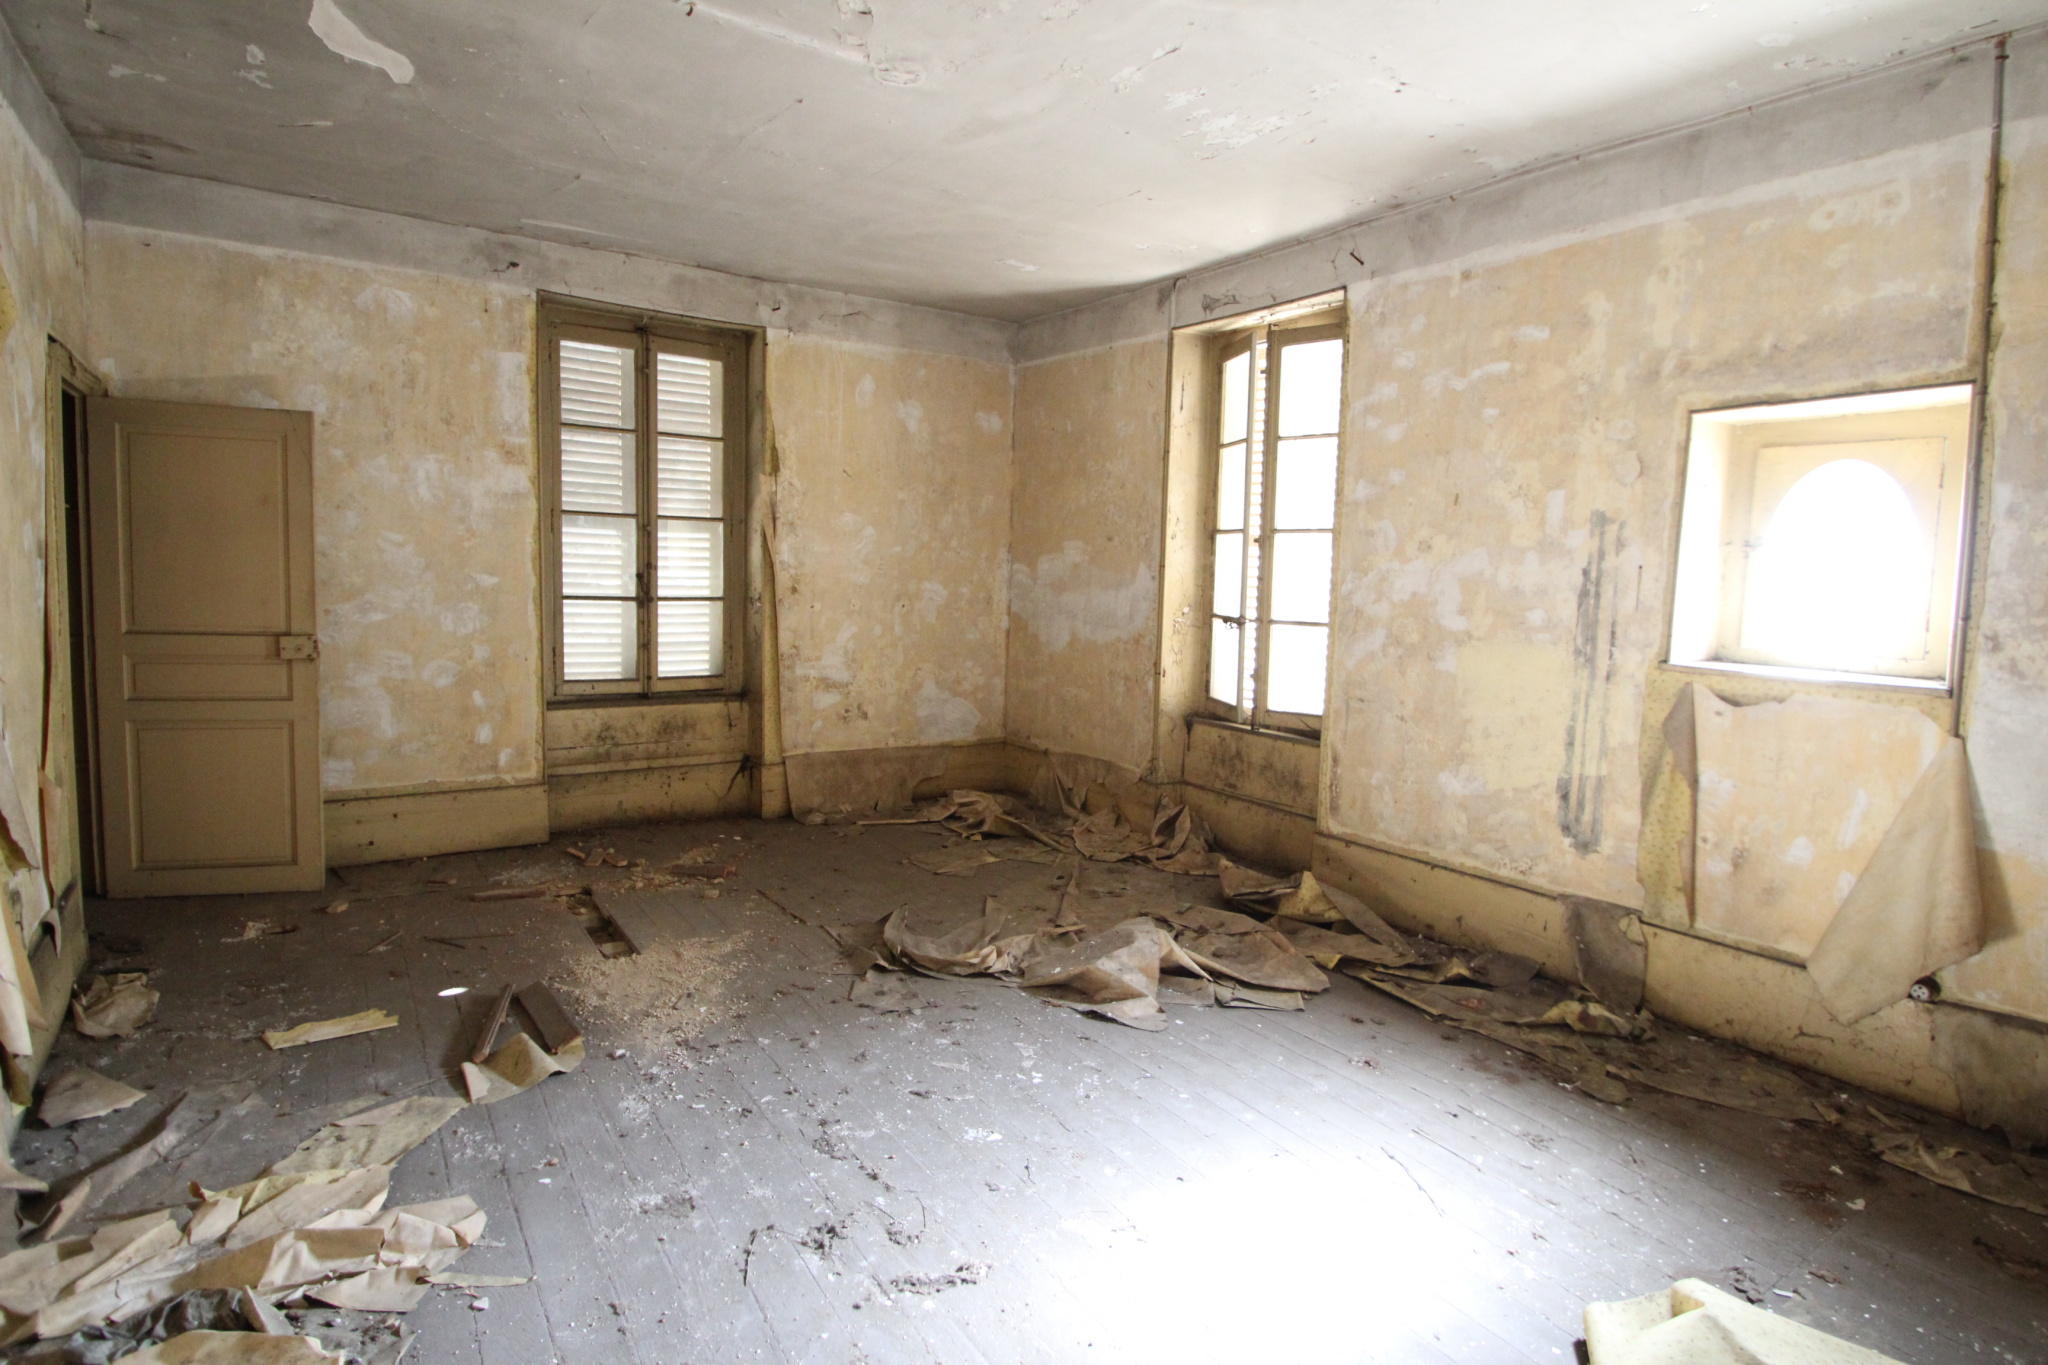 Vente maison/villa dijon 100m